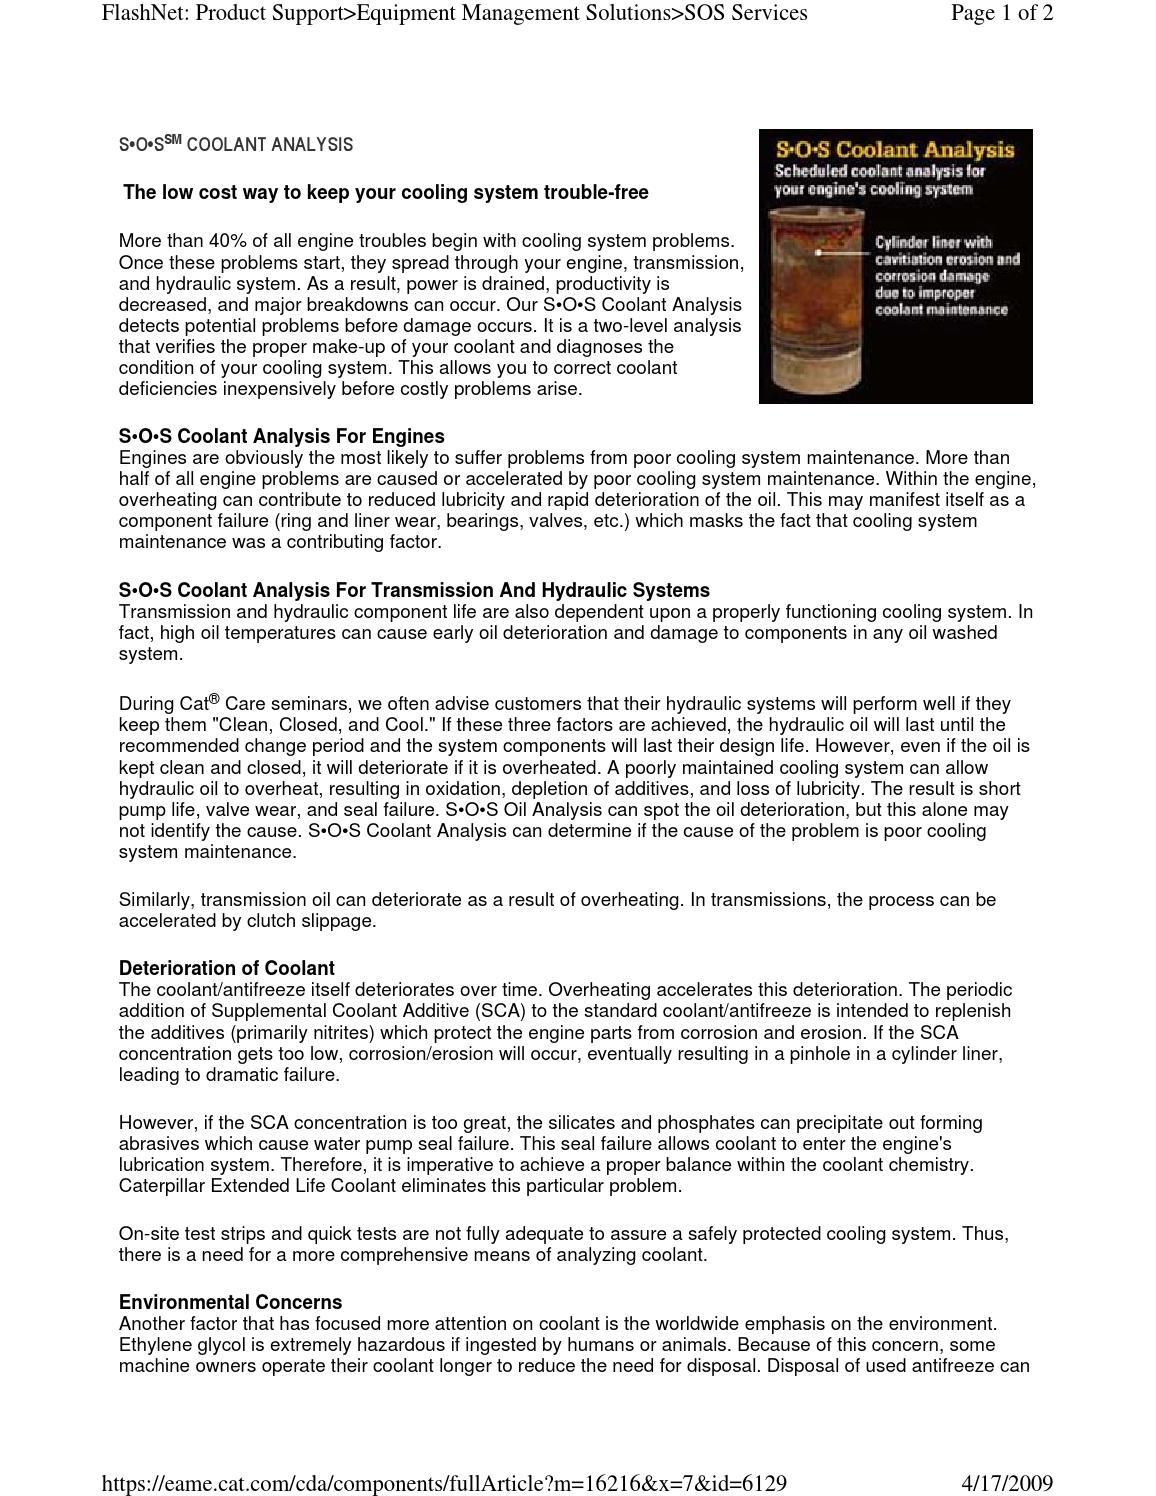 Sos Coolant Analysis By Michigan Cat Issuu Caterpillar Engine